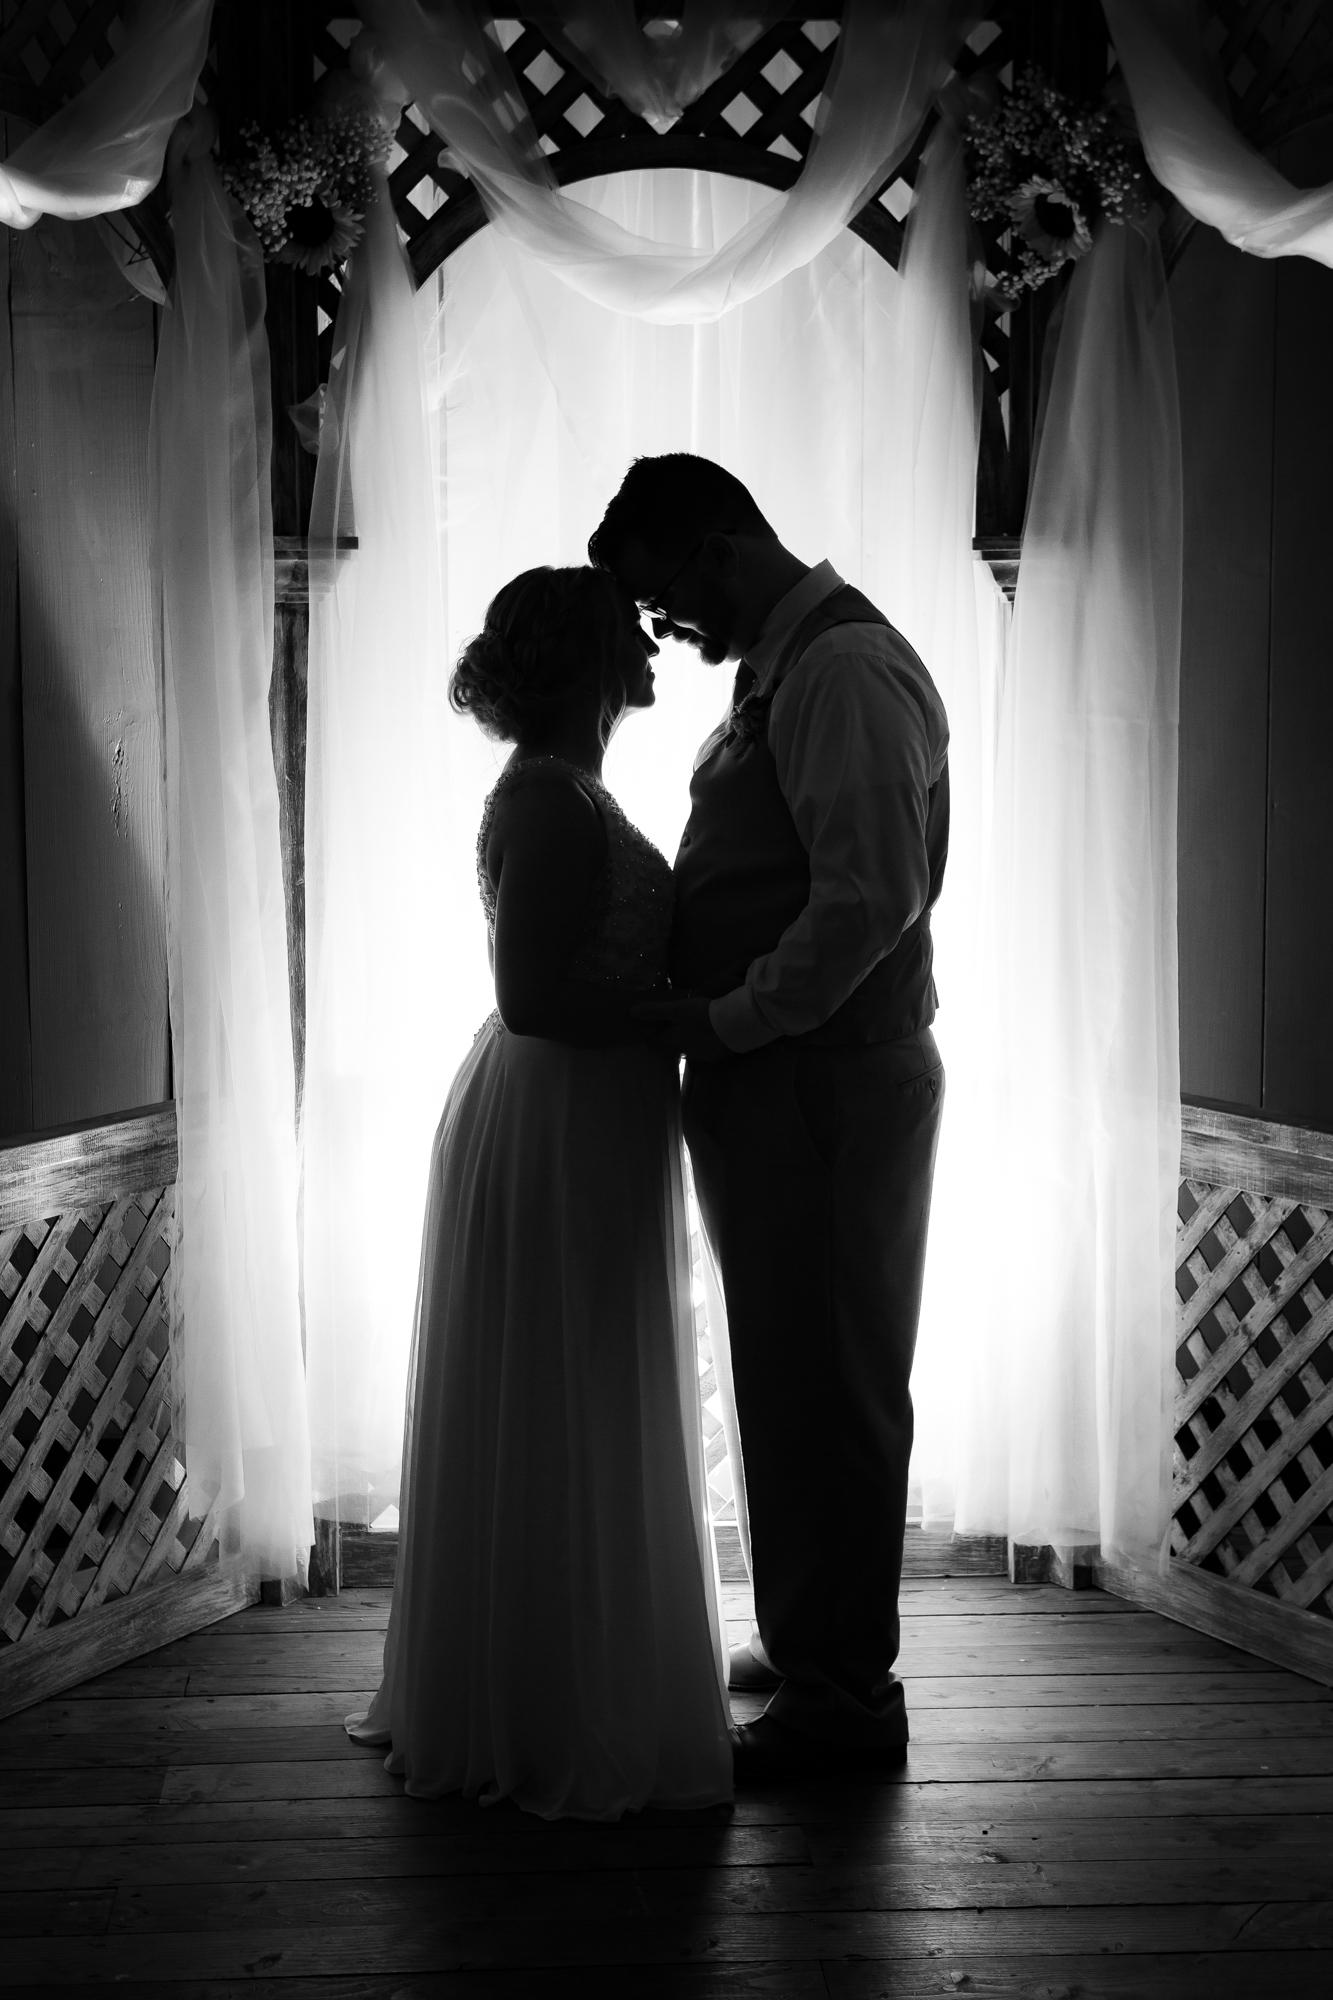 Wedding-Carriage-House-Oneonta-NY-0812.jpg